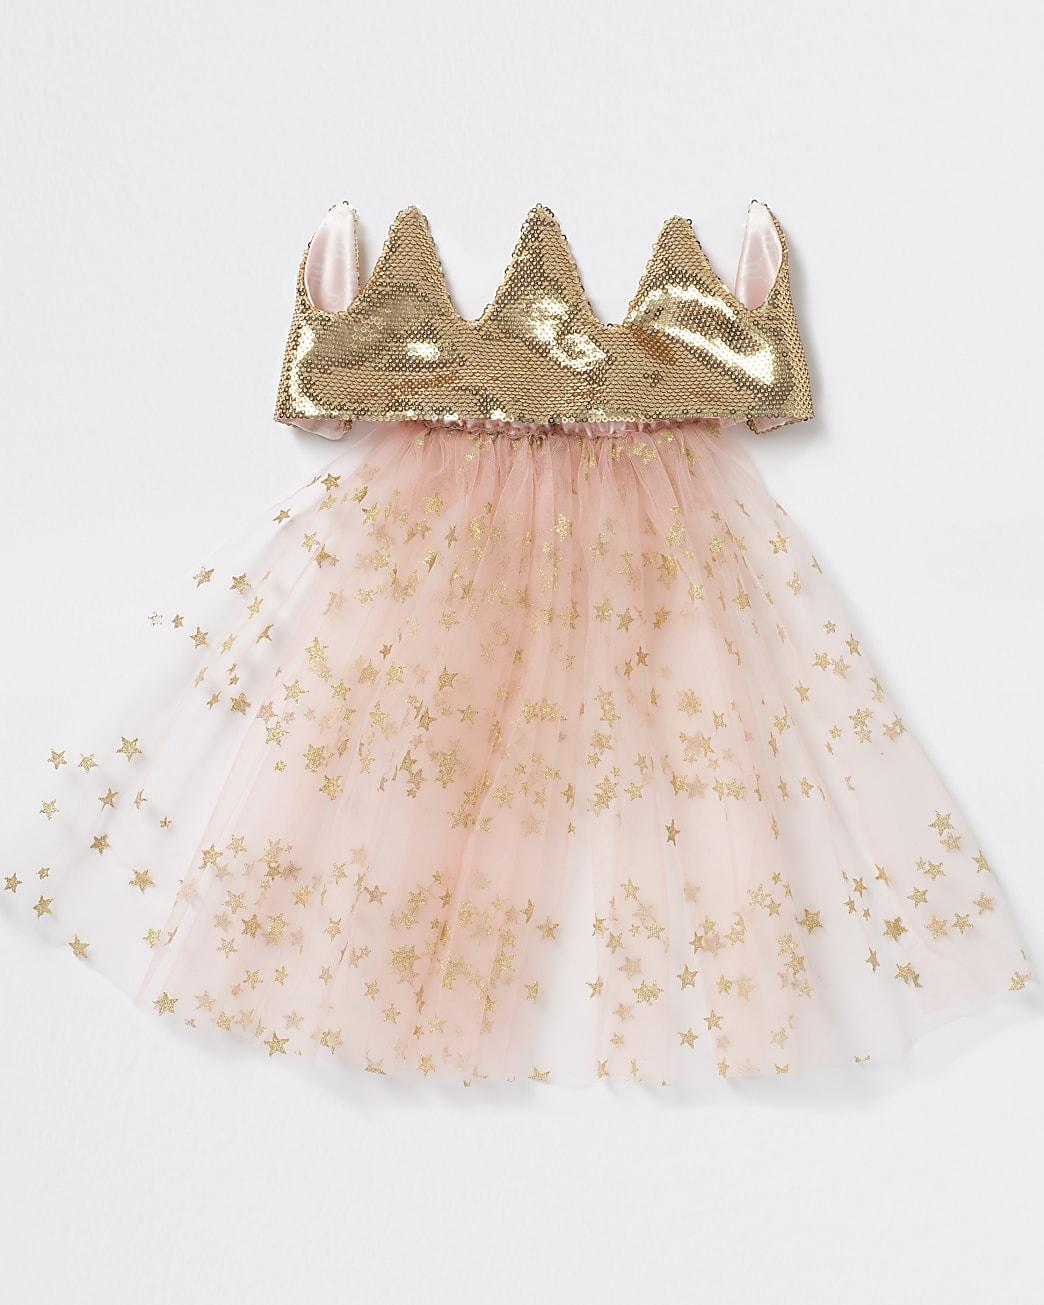 Girls pink crown with veil headband